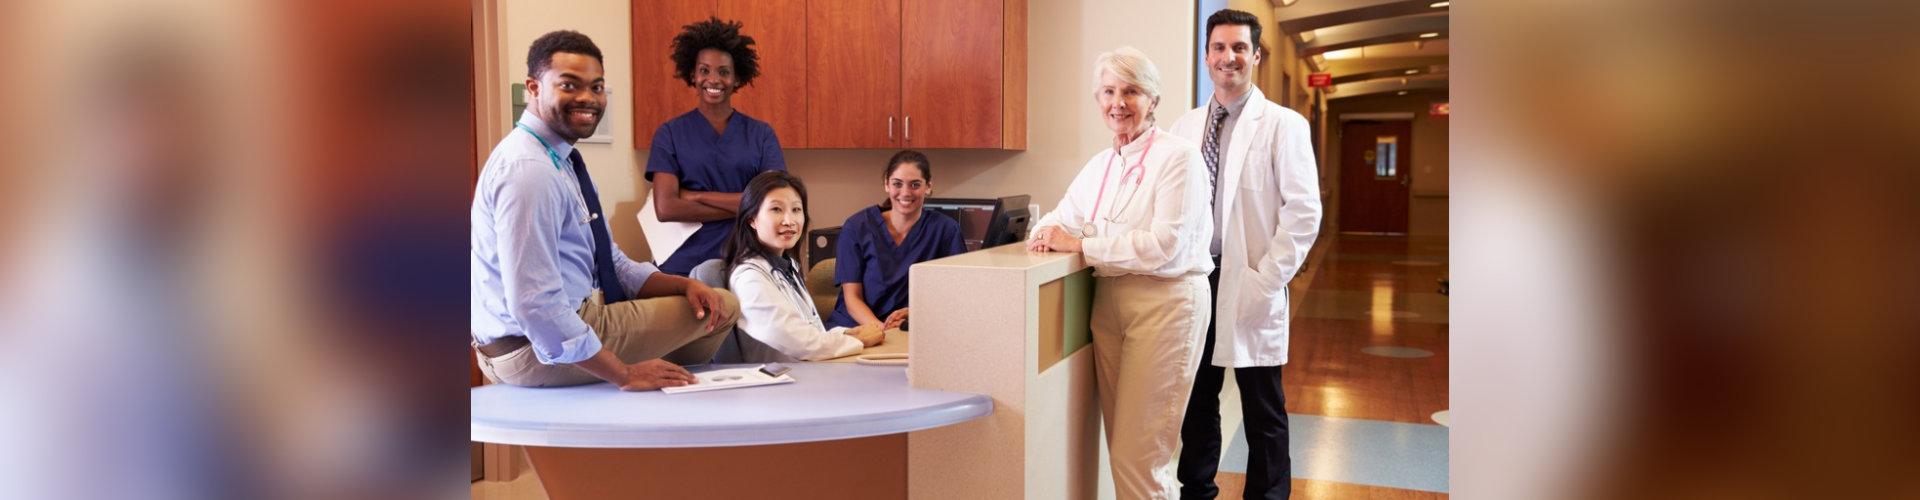 Portrait Of Medical Staff At Nurse s Station In Hospital